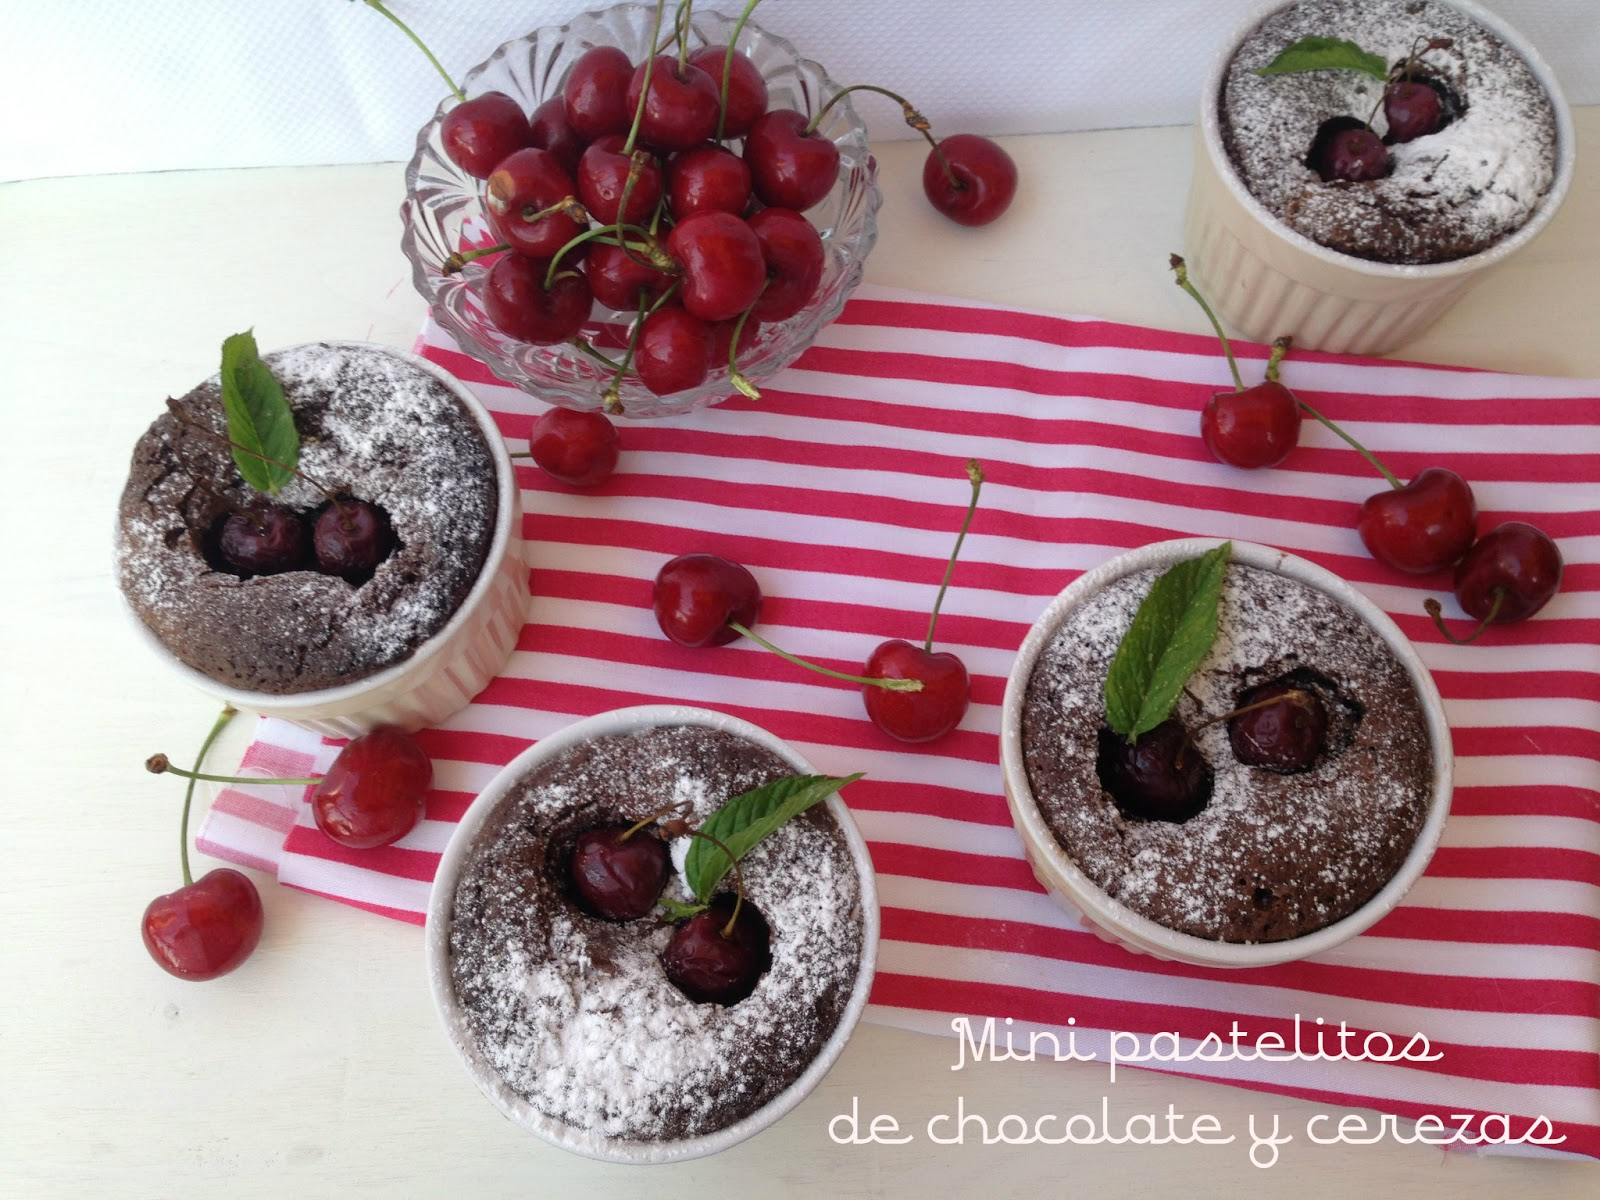 pastelitos-de-chocolate-y-cerezas, chocolate-cherry-cakes